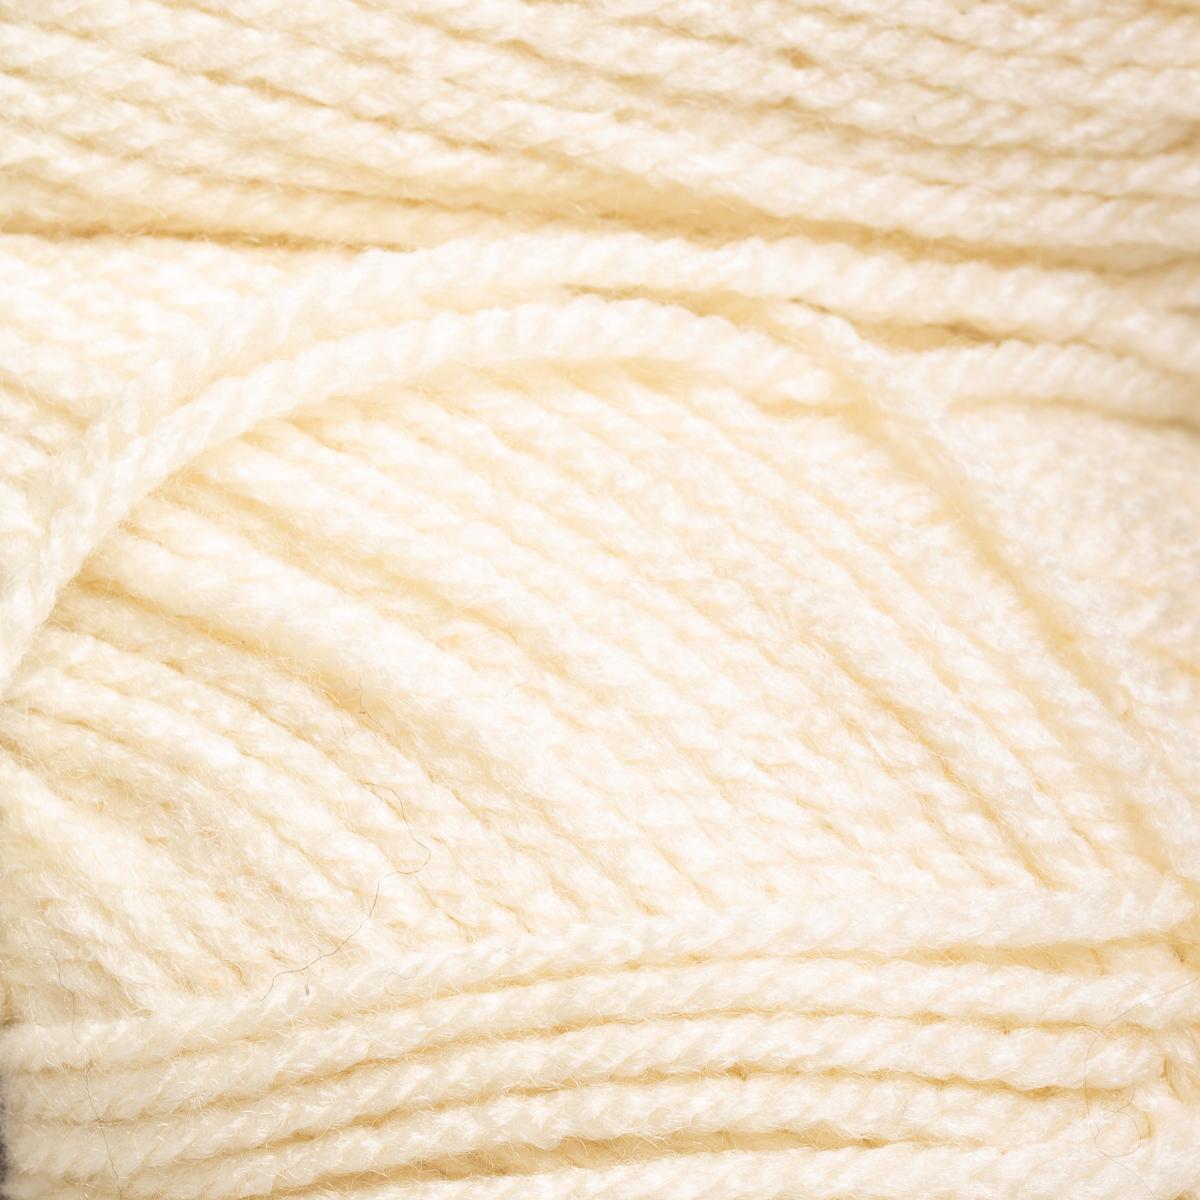 4-Dream-Weaver-Solid-S-Twist-100-Acrylic-Yarn-Skeins-Light-3-Knit-Crochet-Soft thumbnail 10